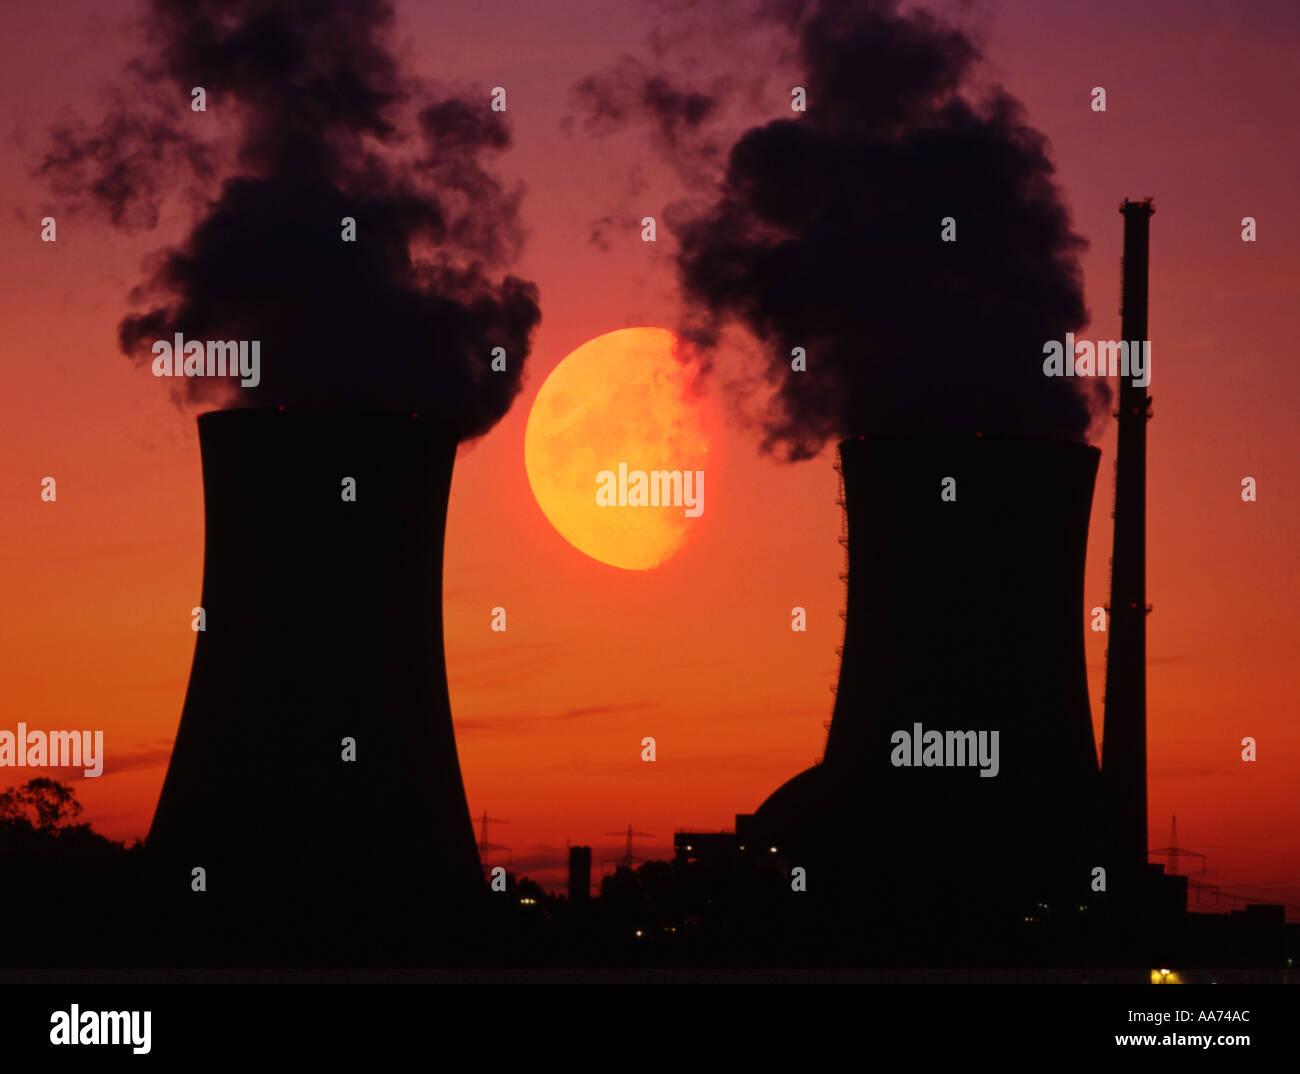 nuclear power station cooling towers symbolic emission atomic energy - Stock Image